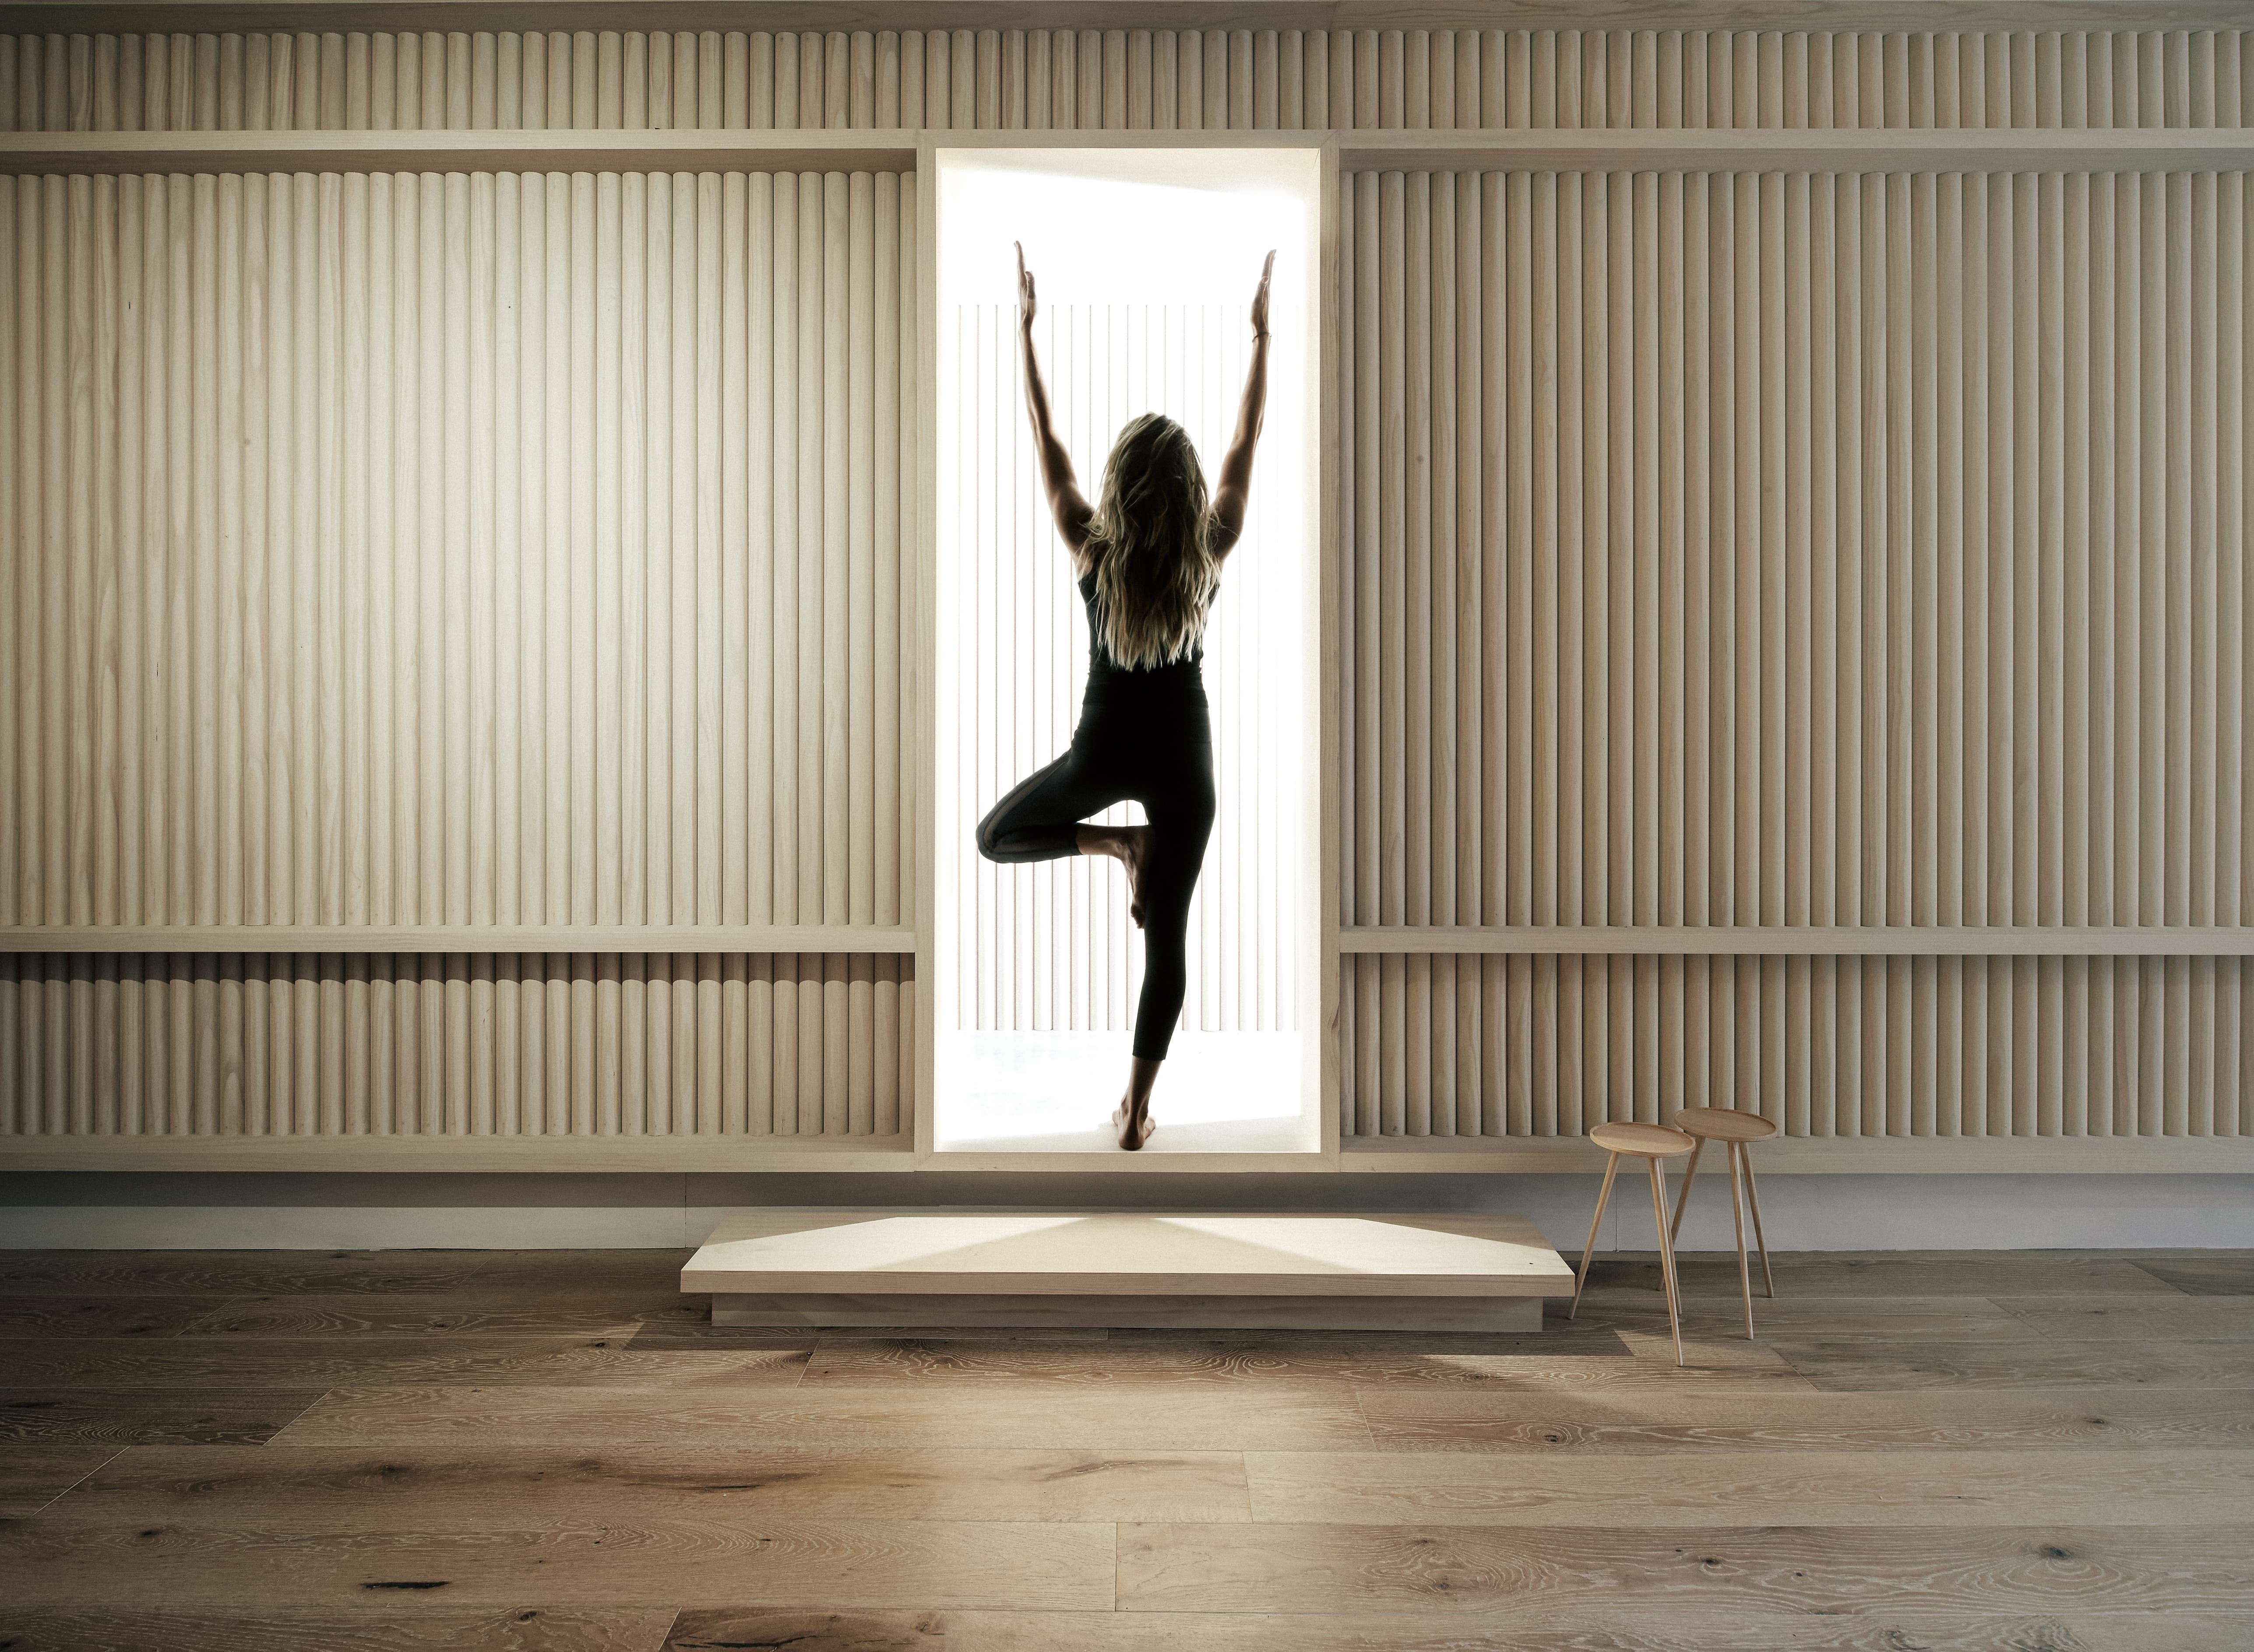 Local Australian Interior Design-Move Yoga Designed by Hecker Guthrie